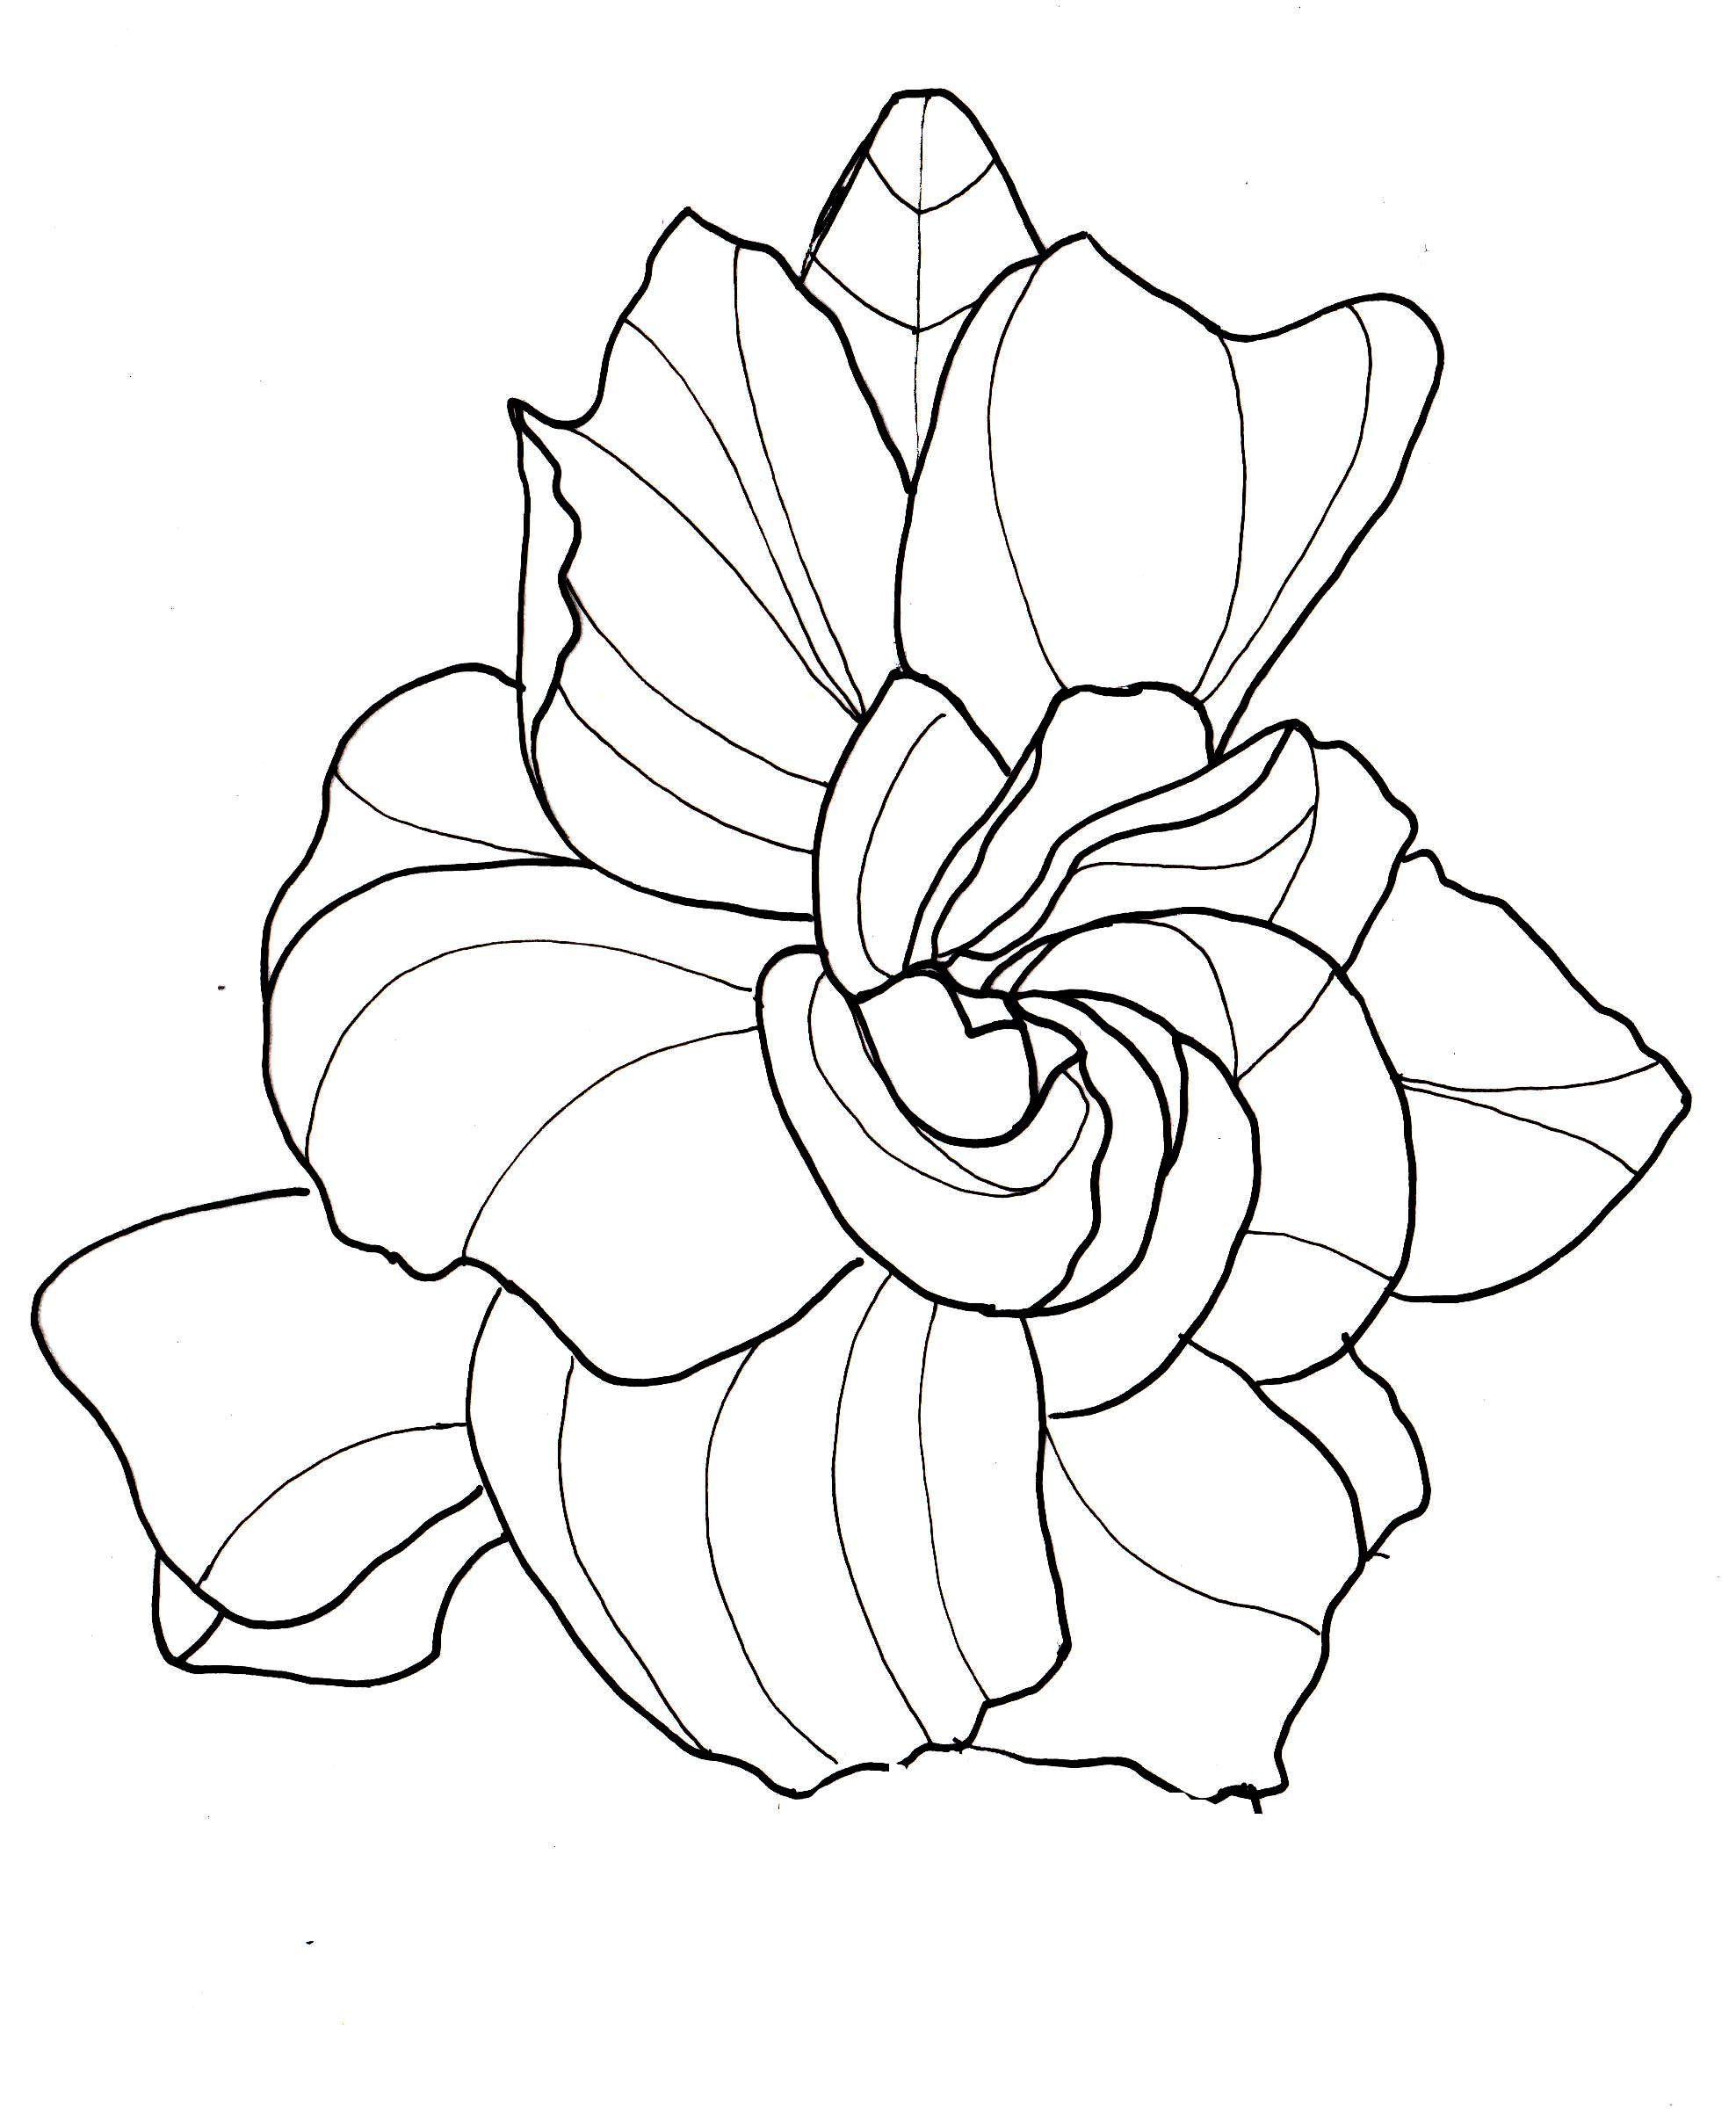 Line Drawing Flowers Gardenia Flower Line Drawings Flower Drawing Gardenia Tattoo